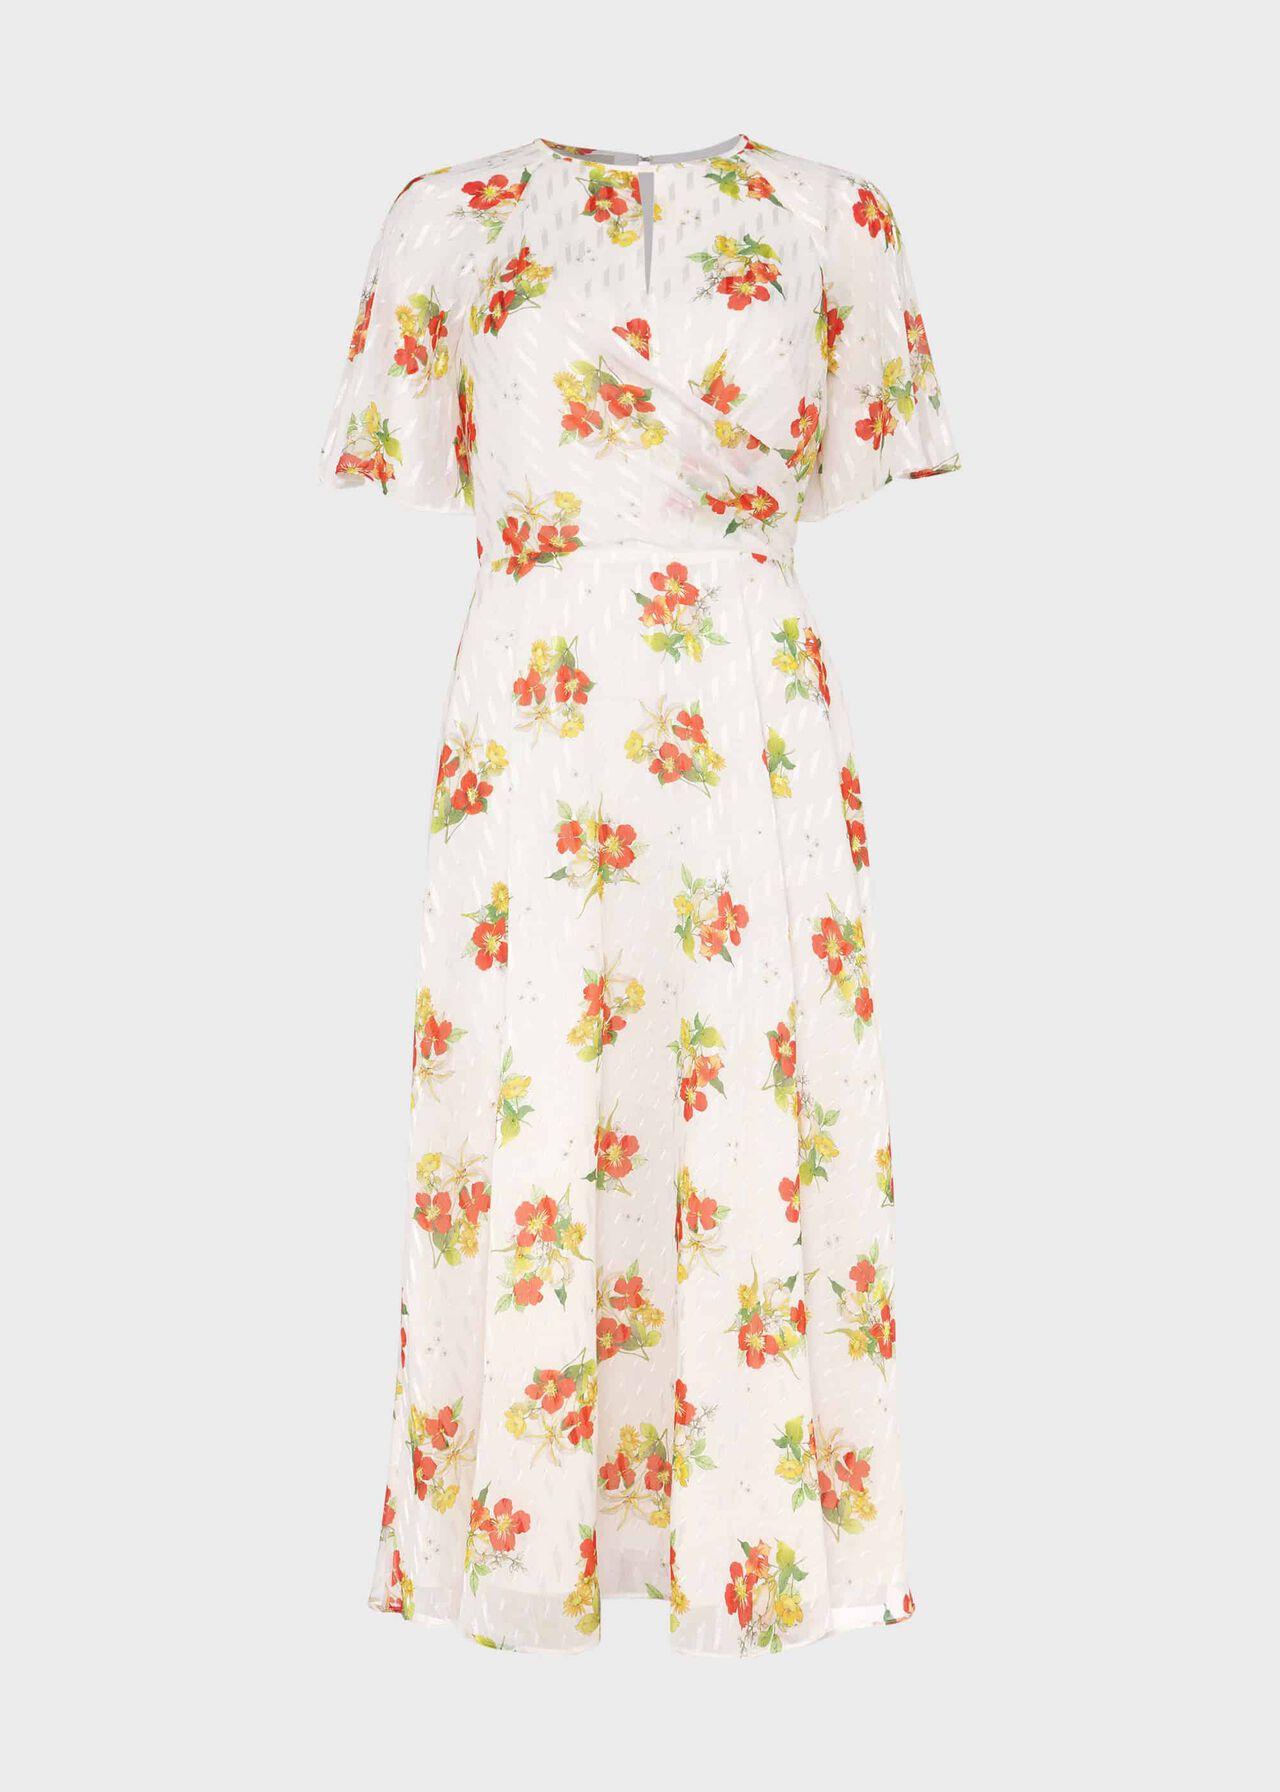 Savannah Floral Jacquard Dress Ivory Multi